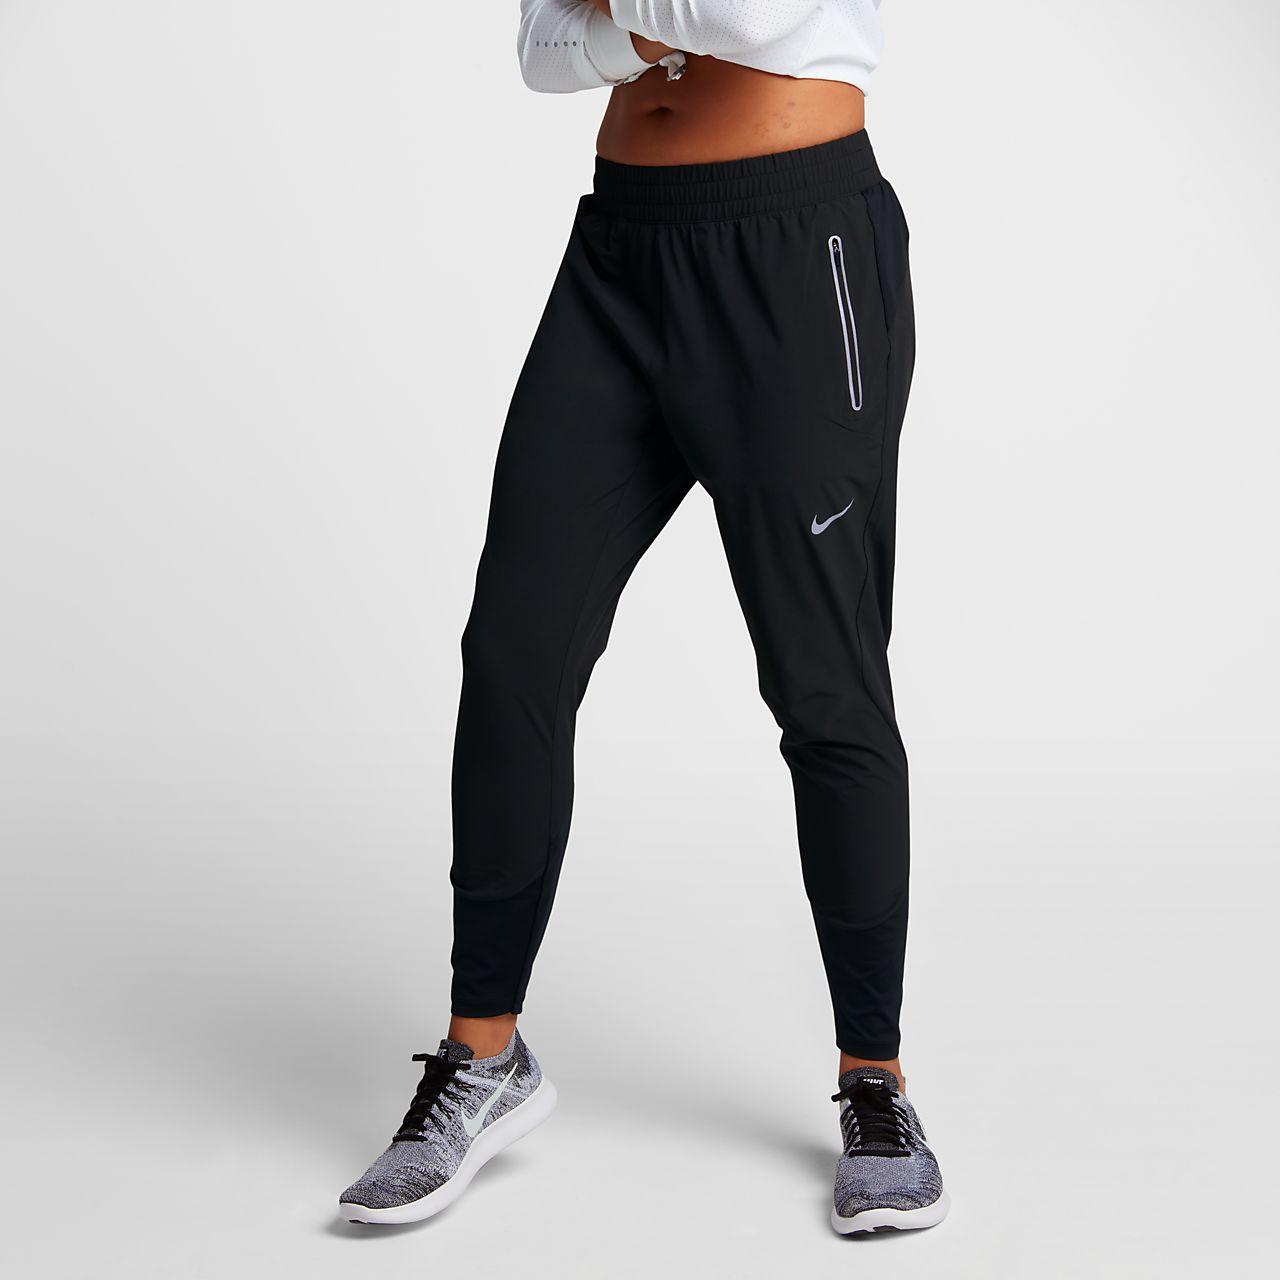 69e544411bb596 ... Nike Swift Damen-Laufhose (ca. 68